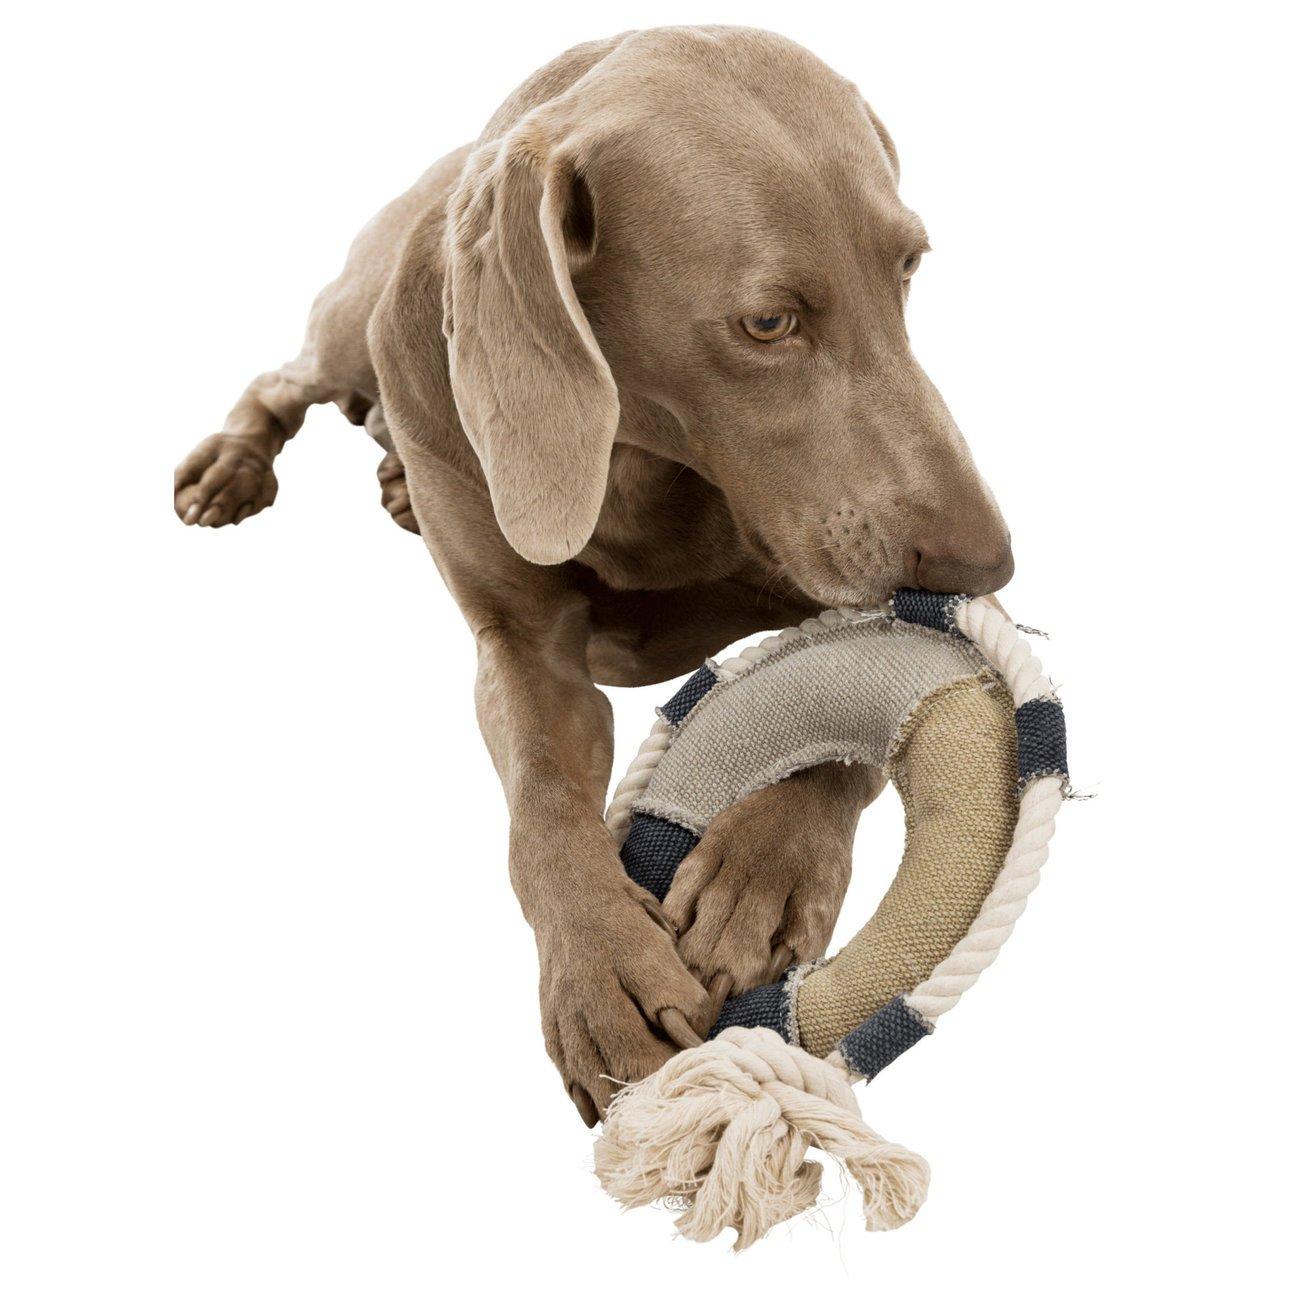 Trixie BE NORDIC Rettungsring, Hundespielzeug 35652, Bild 5